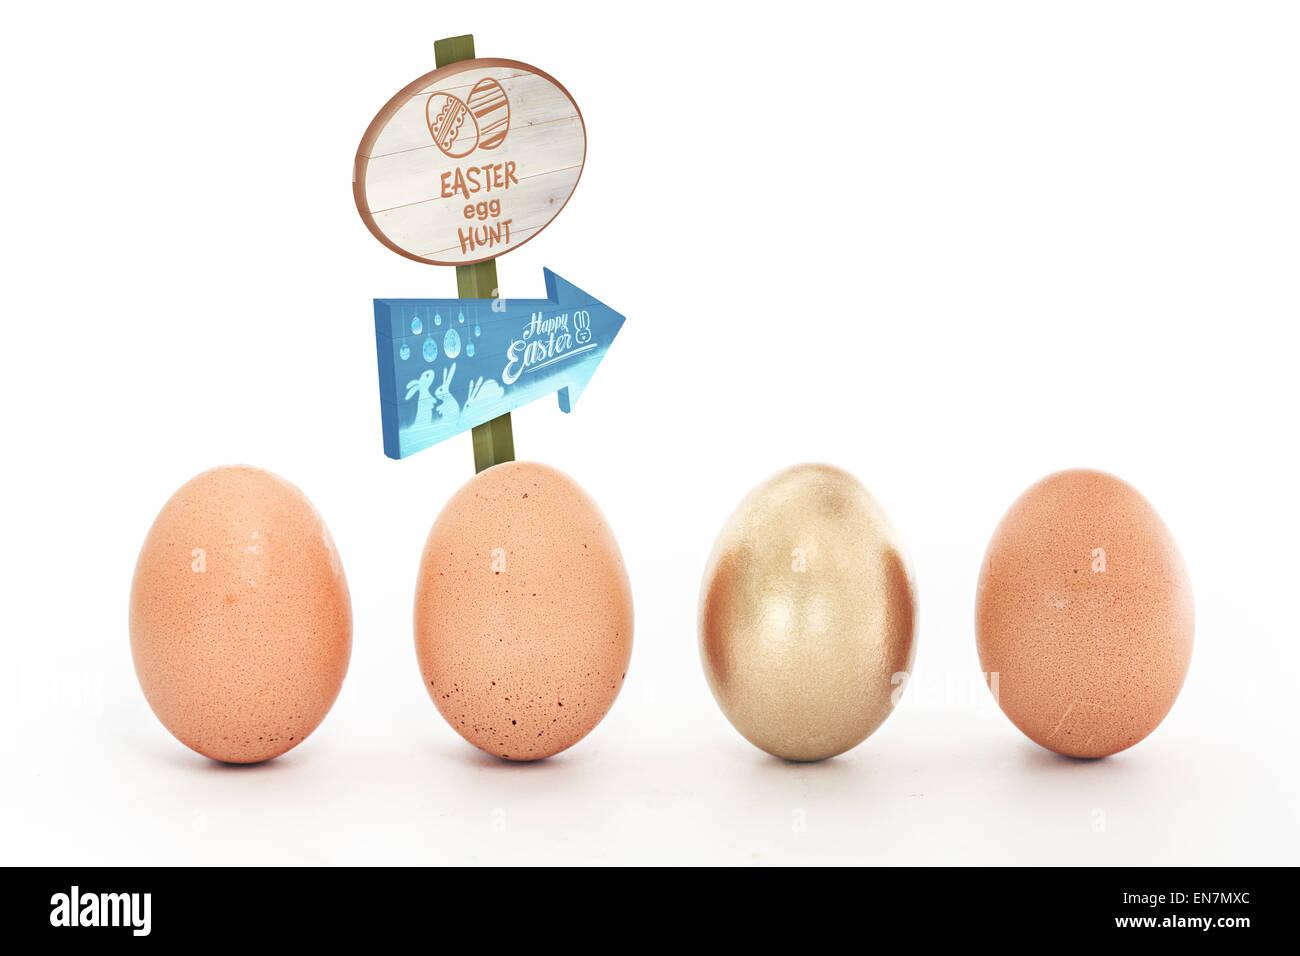 Composite image of easter egg hunt sign - Stock Image